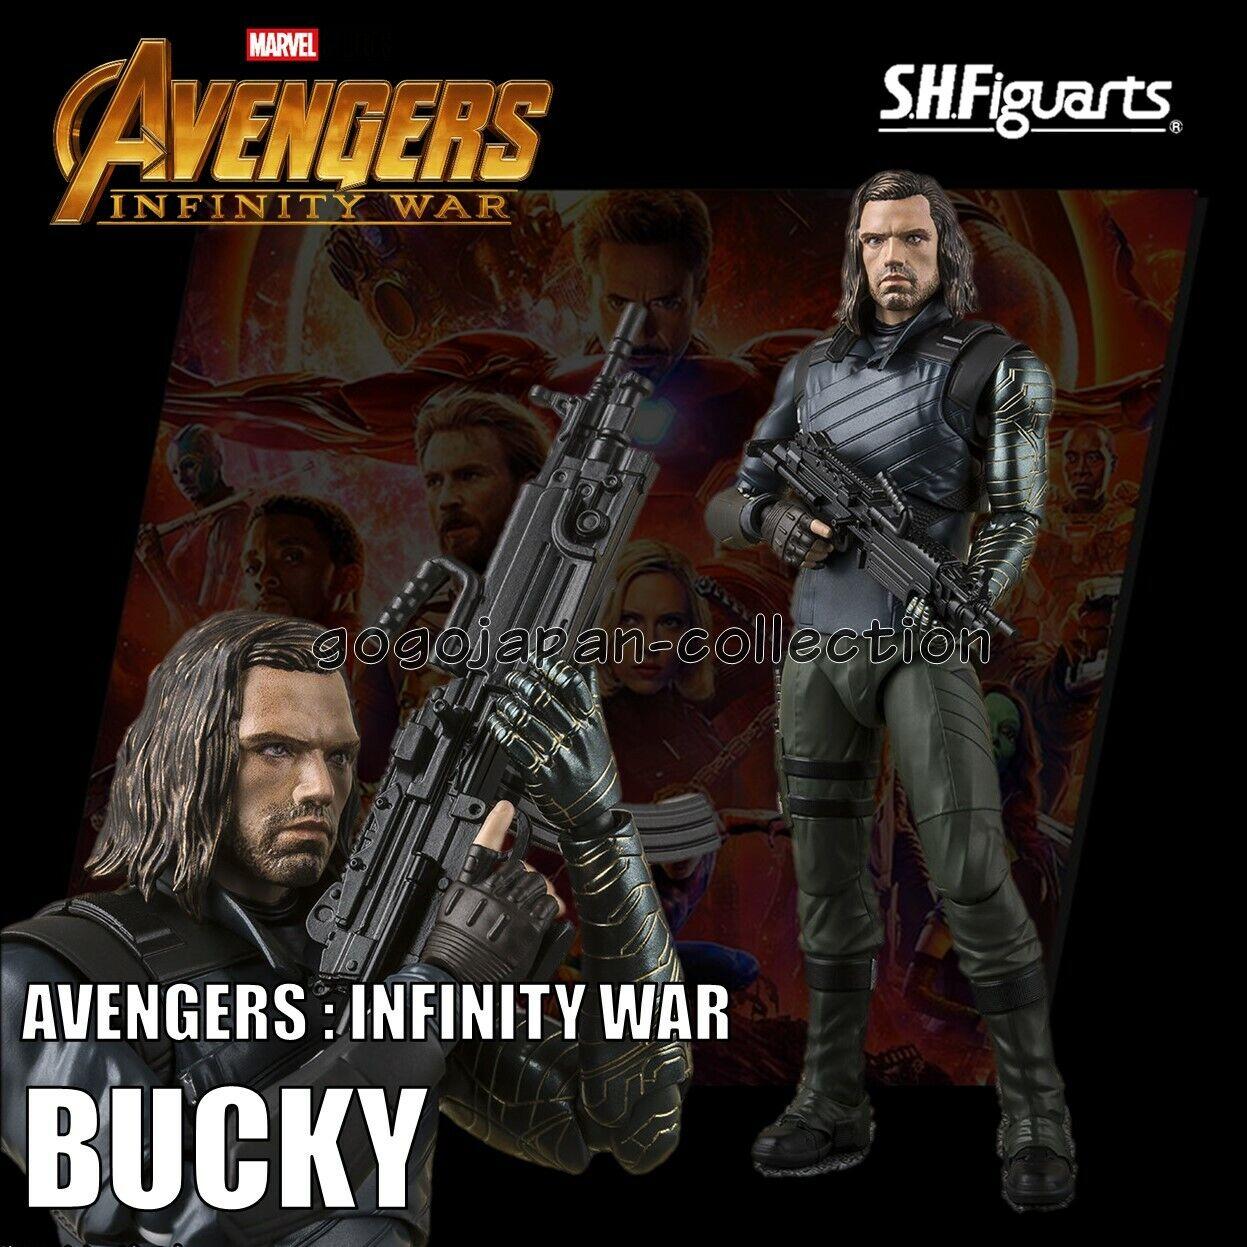 Bandai S.H. Figuarts figura de los Vengadores Infinito guerra Bucky